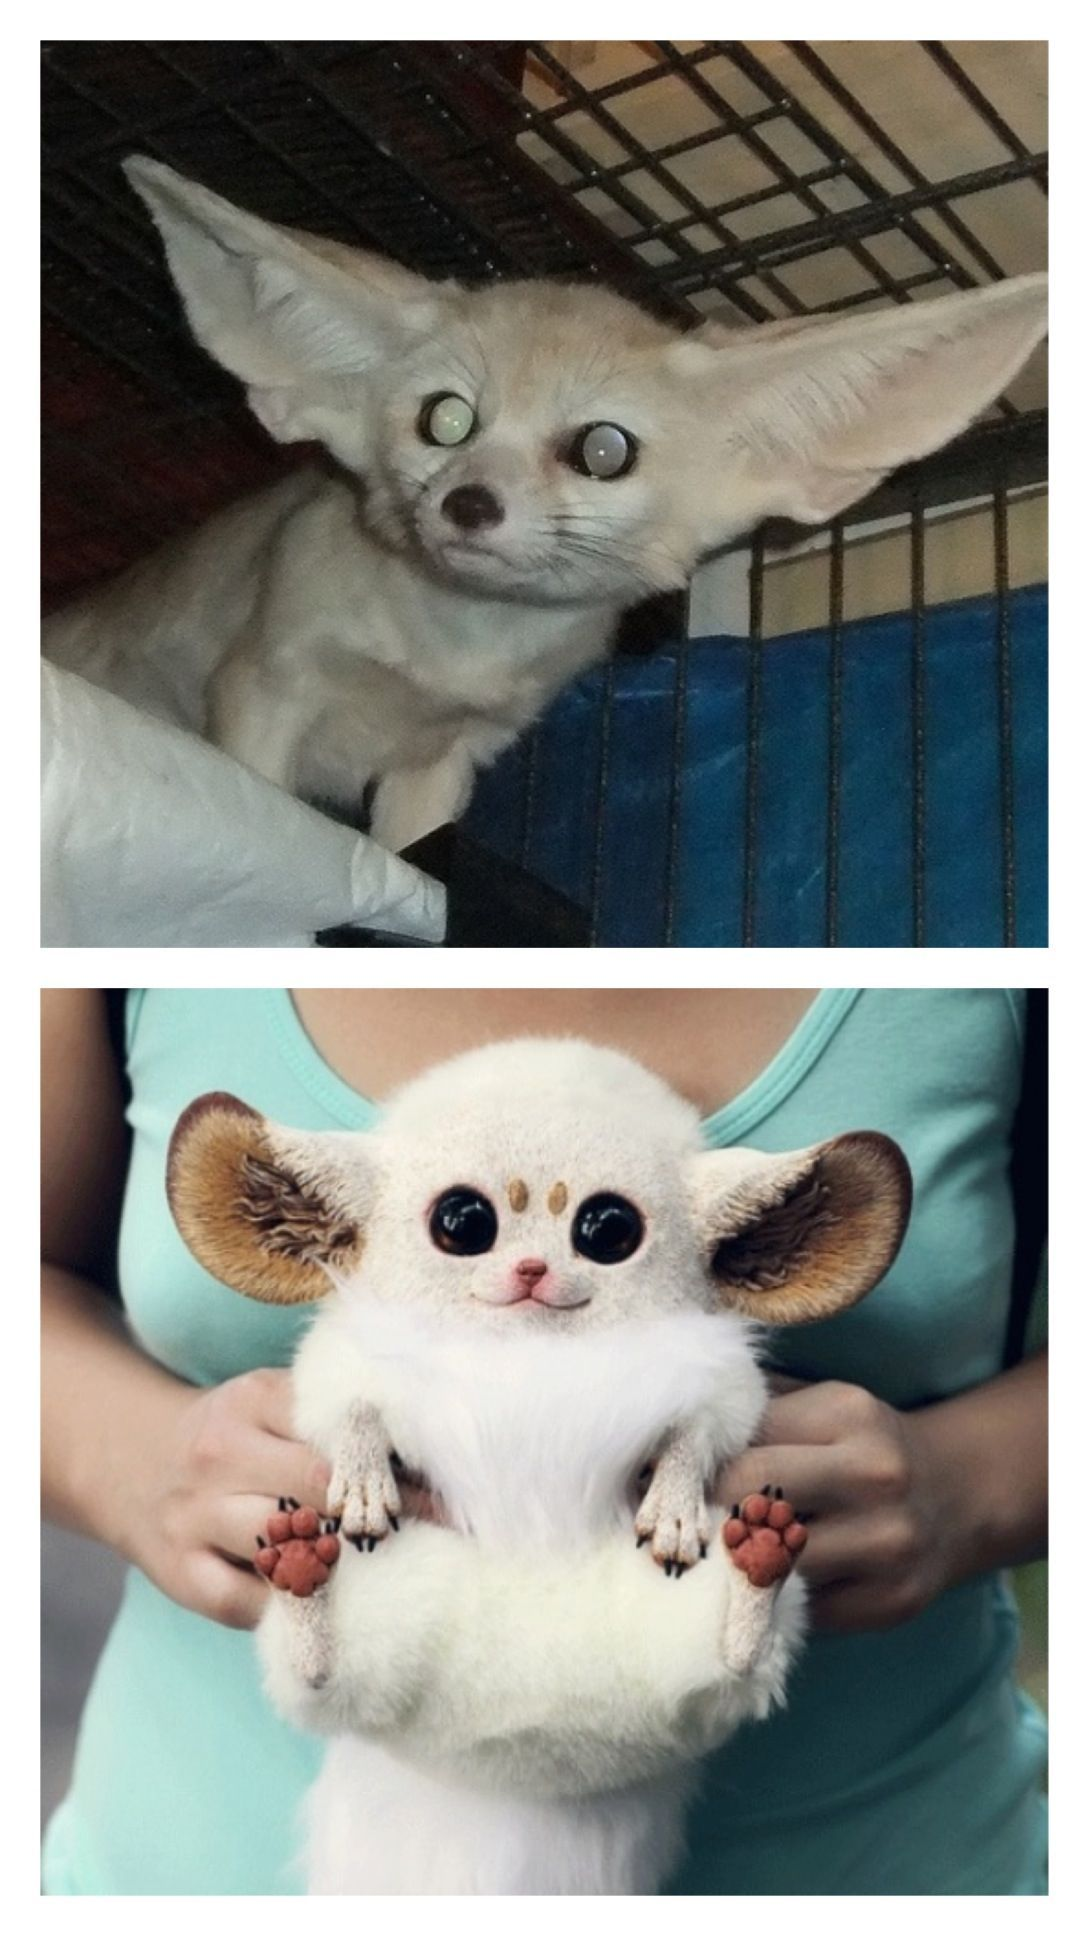 Baby inari fox for sale - Top real inari fox fabulous by the way bottom fake